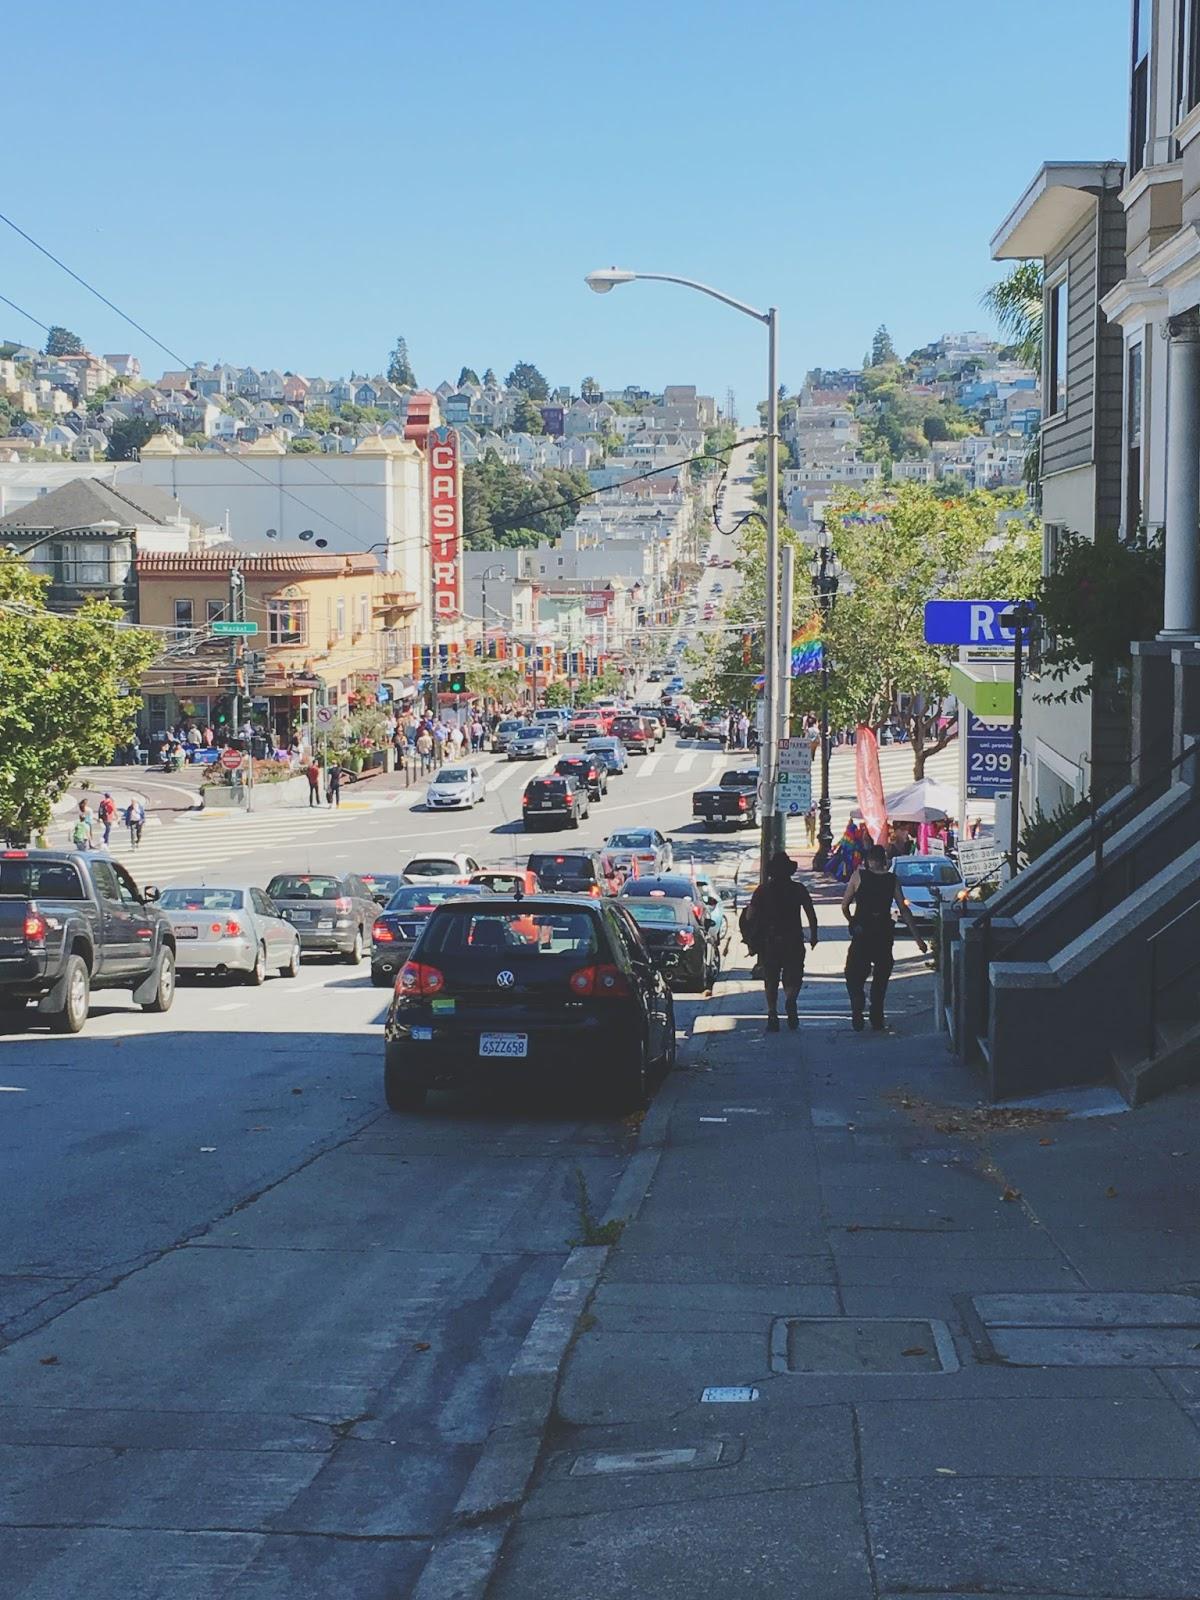 Castro Street in San Francisco, California